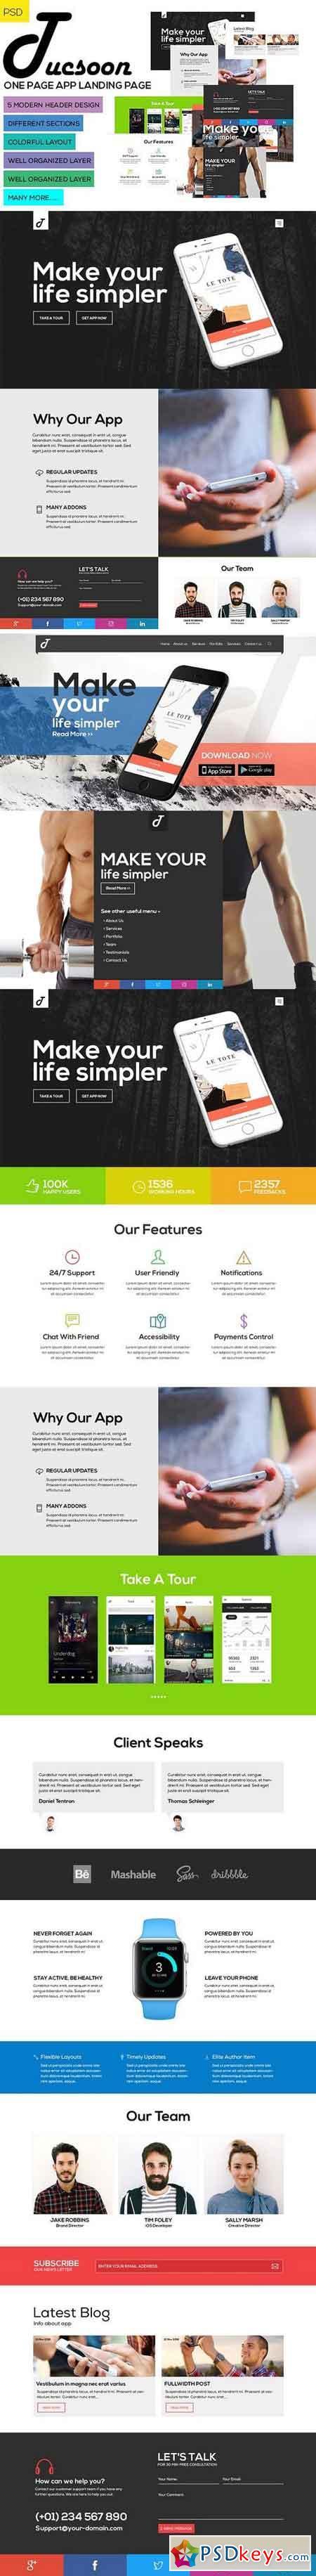 Tucson - PSD - App Landing Page 1063049